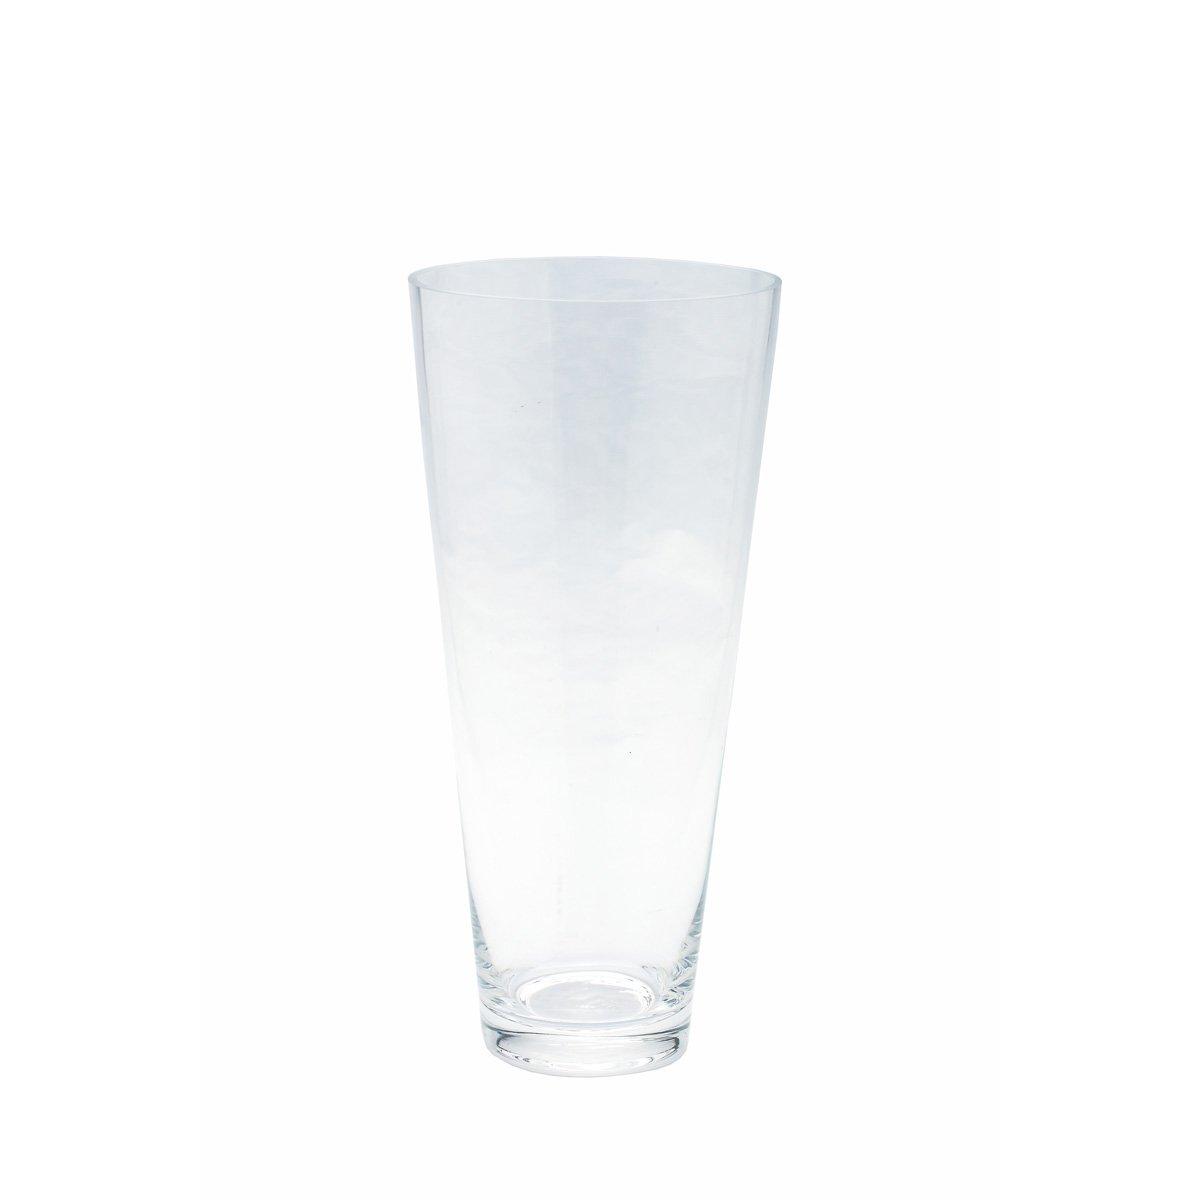 Florero de vidrio transparente grande sears com mx me entiende - Vidrio plastico transparente precio ...